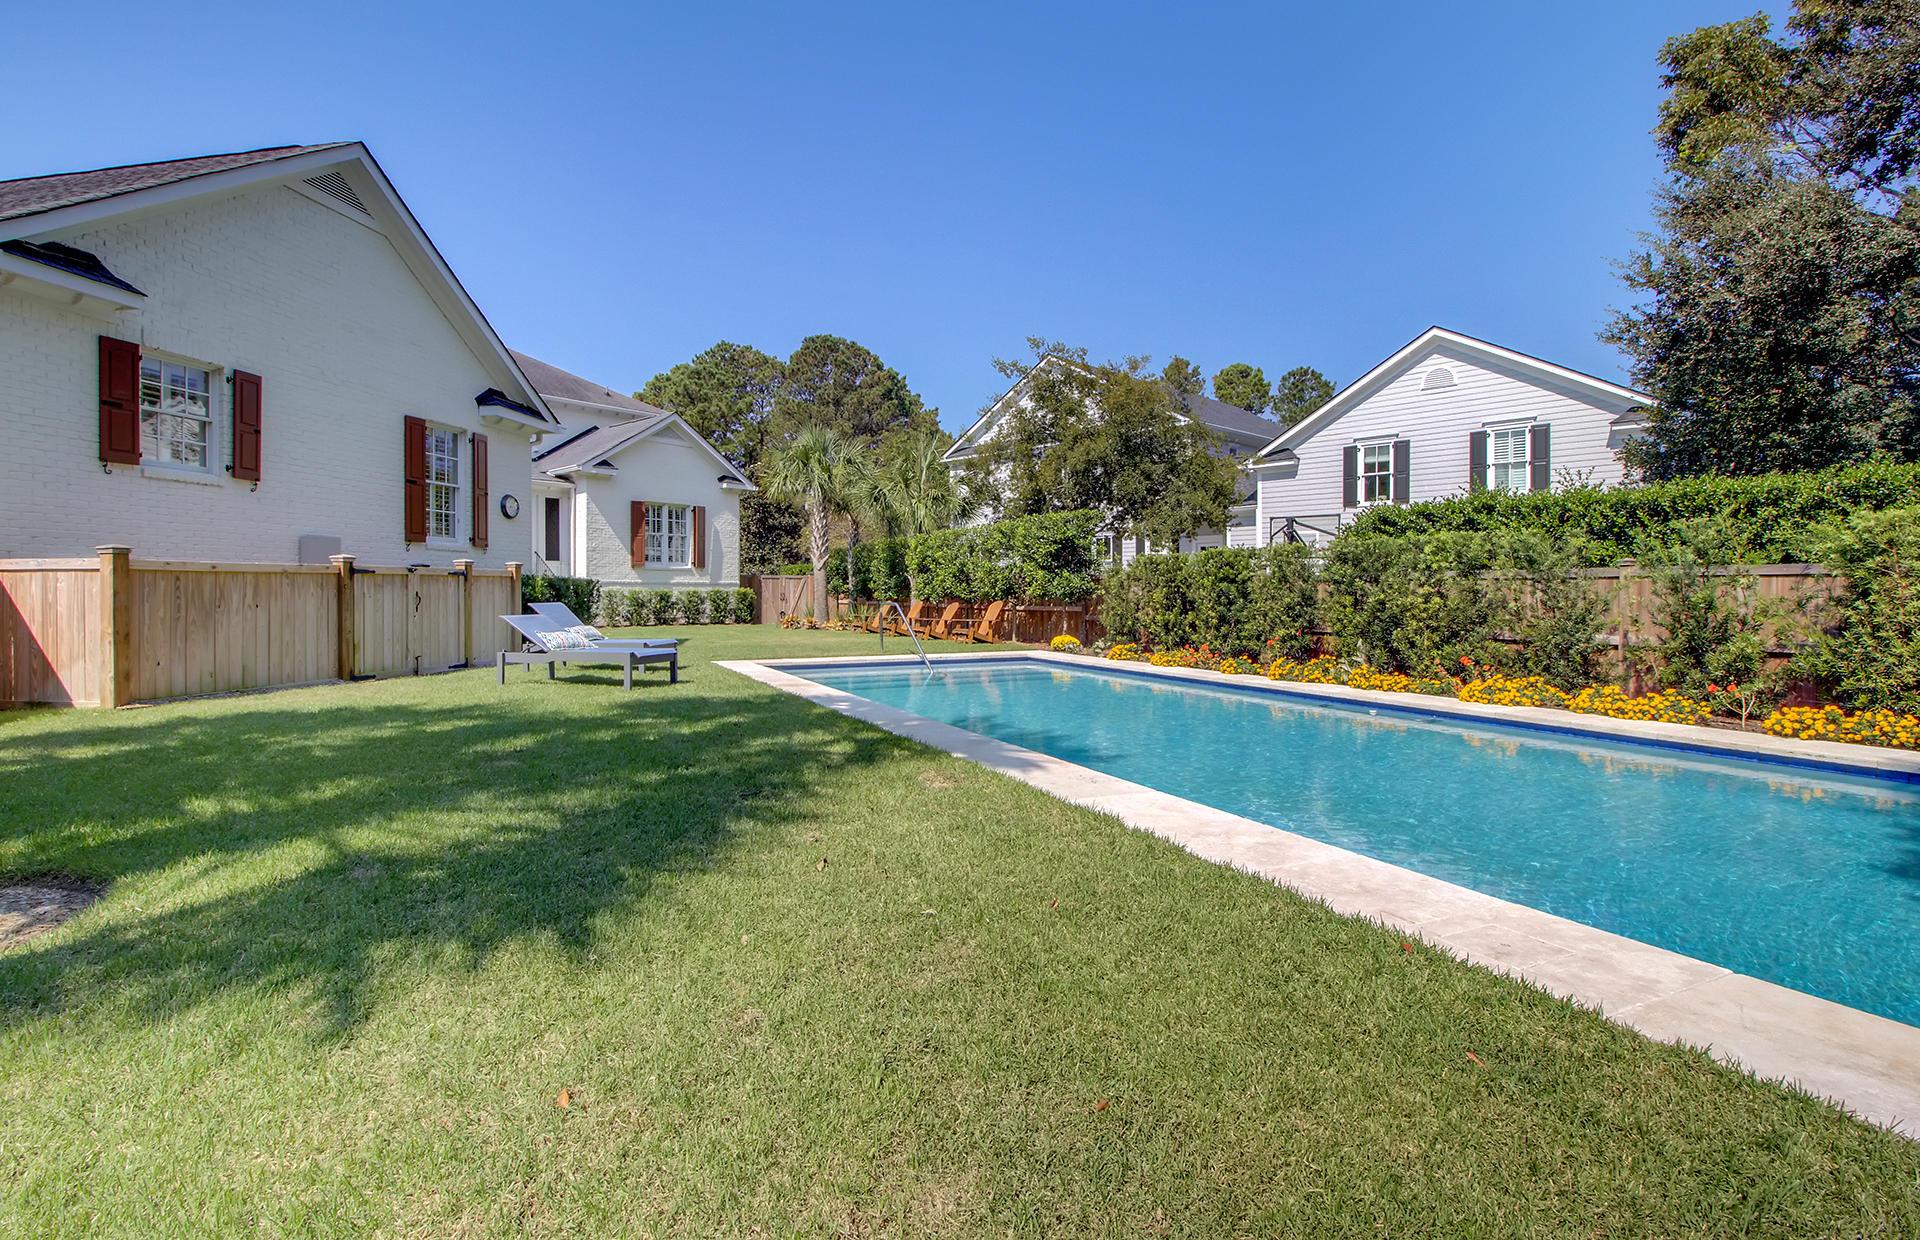 Olde Park Homes For Sale - 770 Olde Central, Mount Pleasant, SC - 25